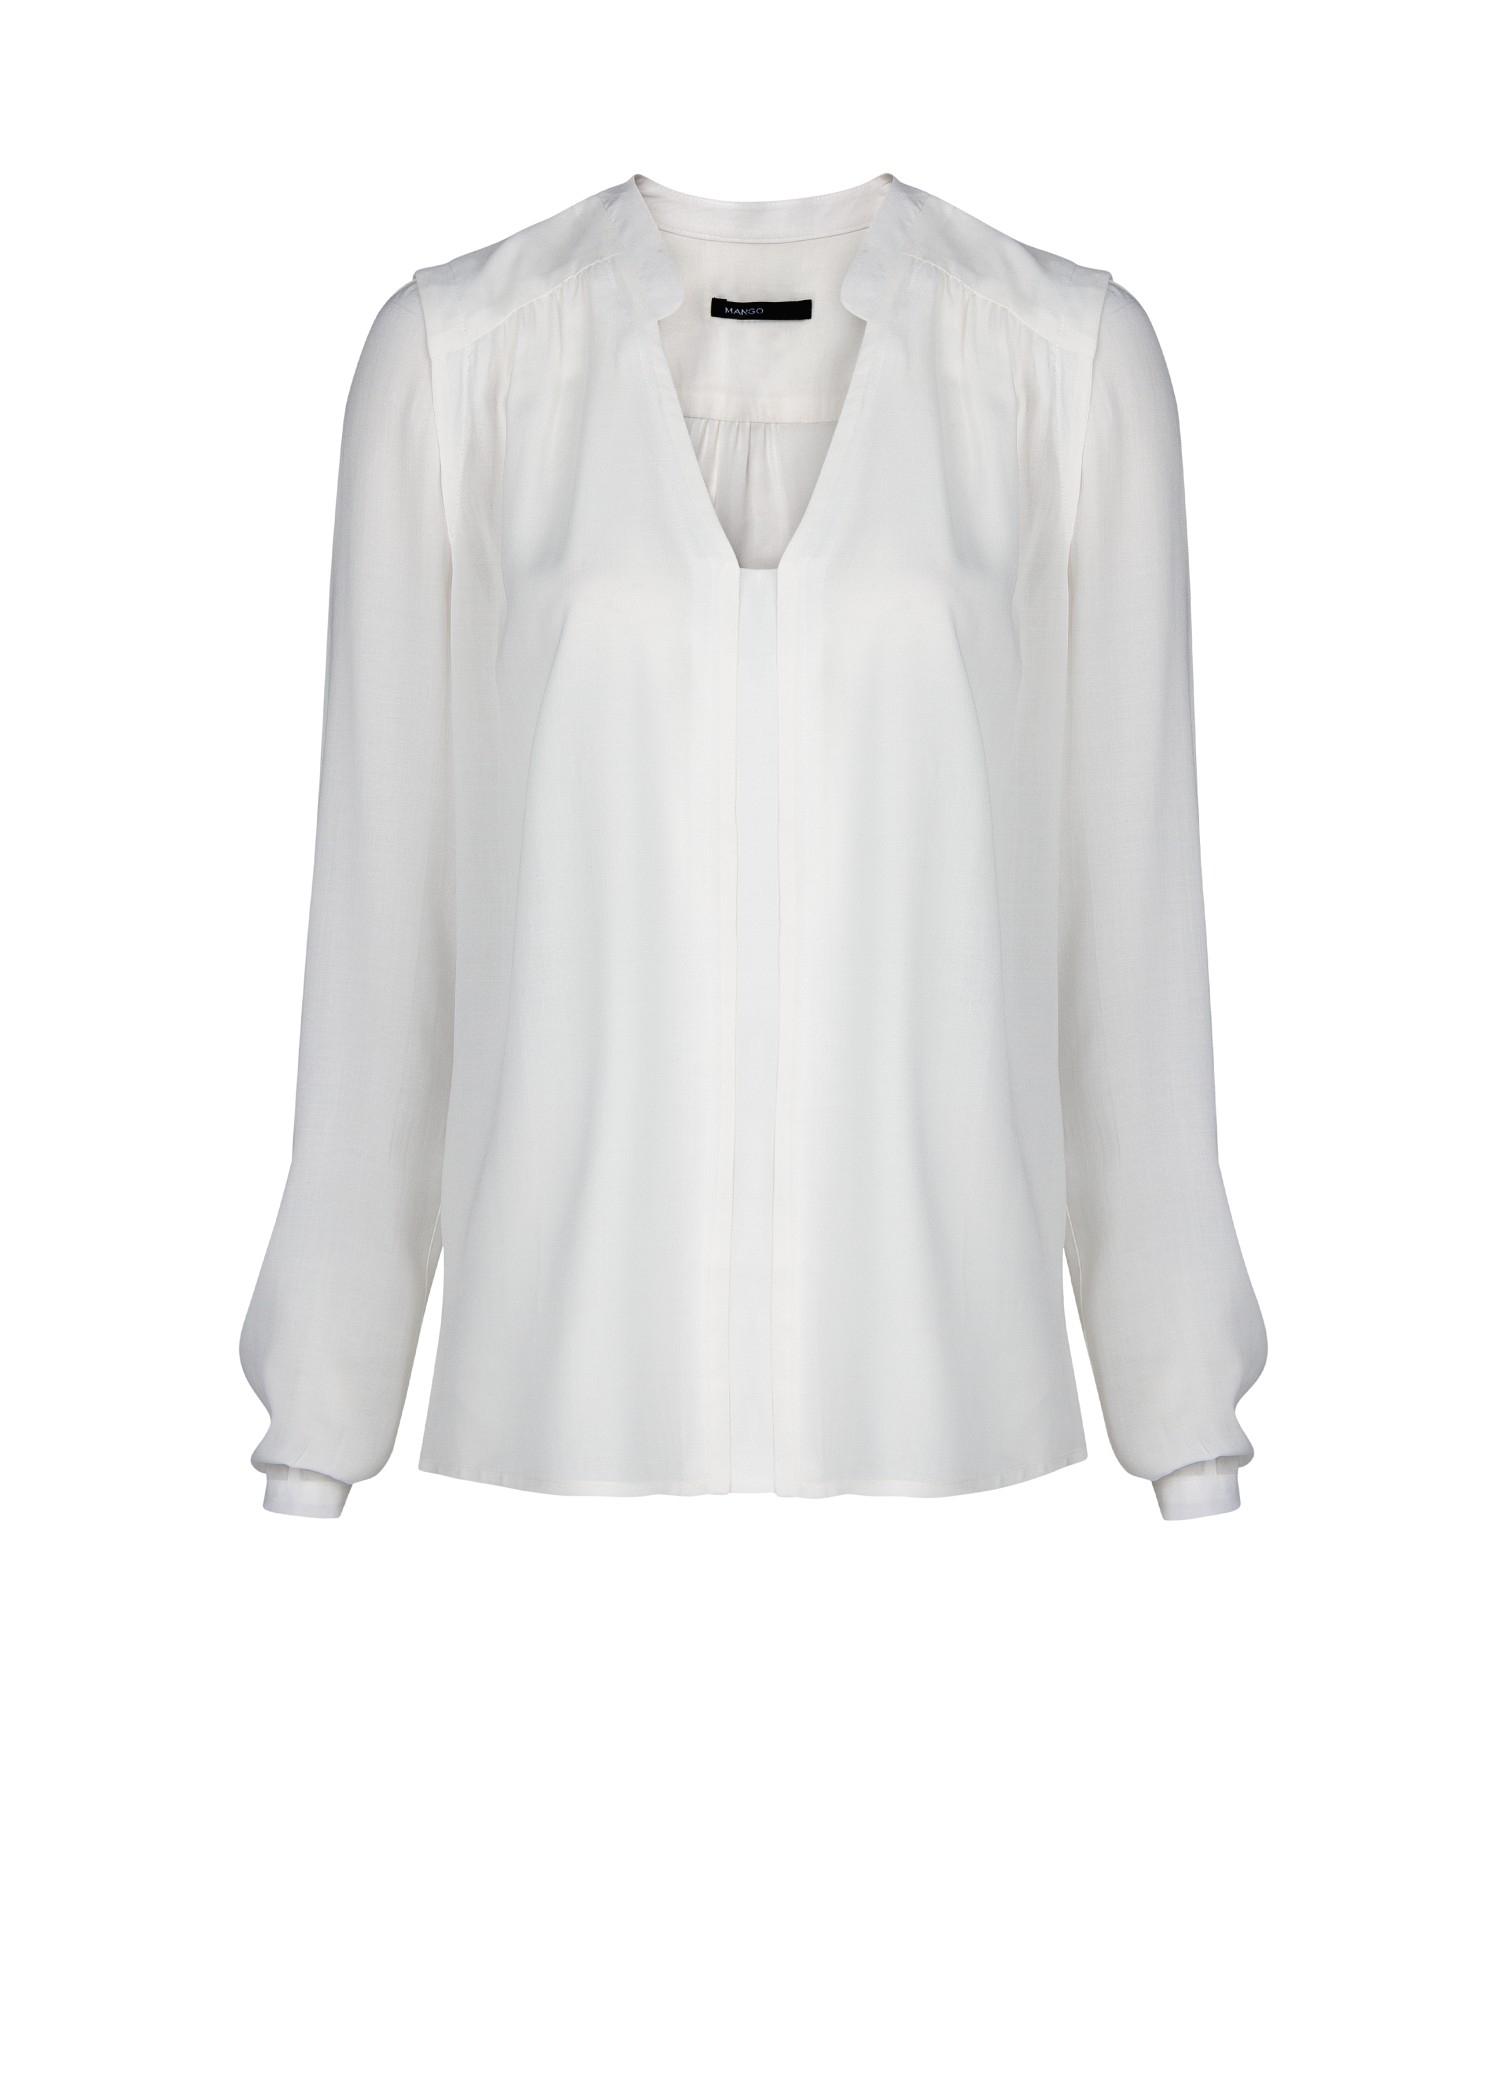 Flowy White Shirt | Is Shirt